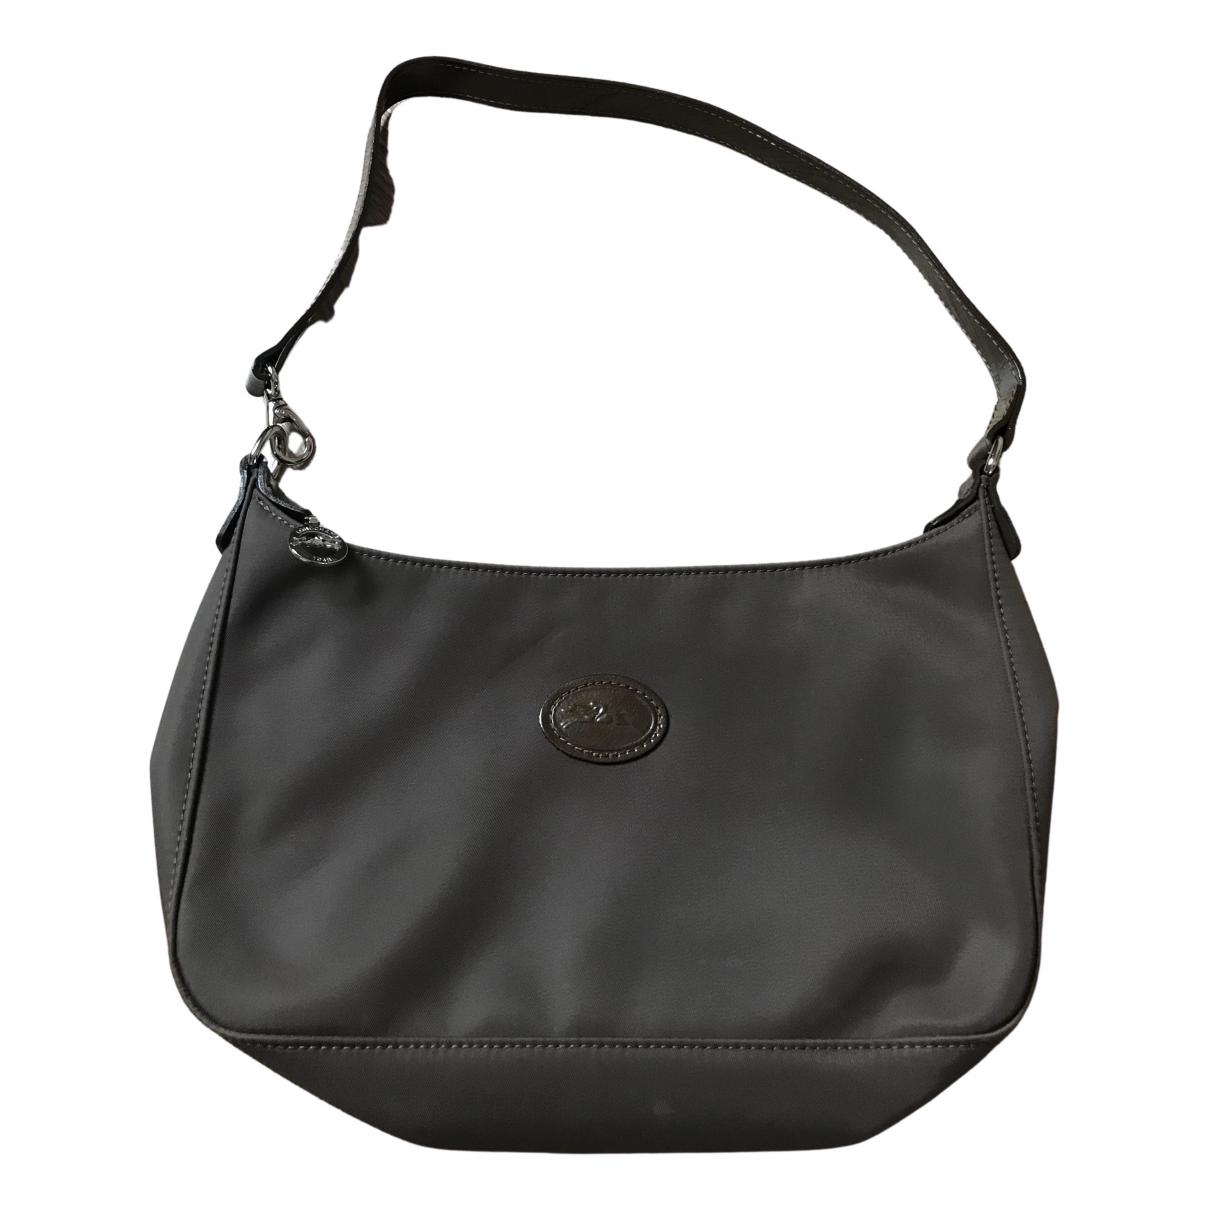 Longchamp \N Brown Clutch bag for Women \N